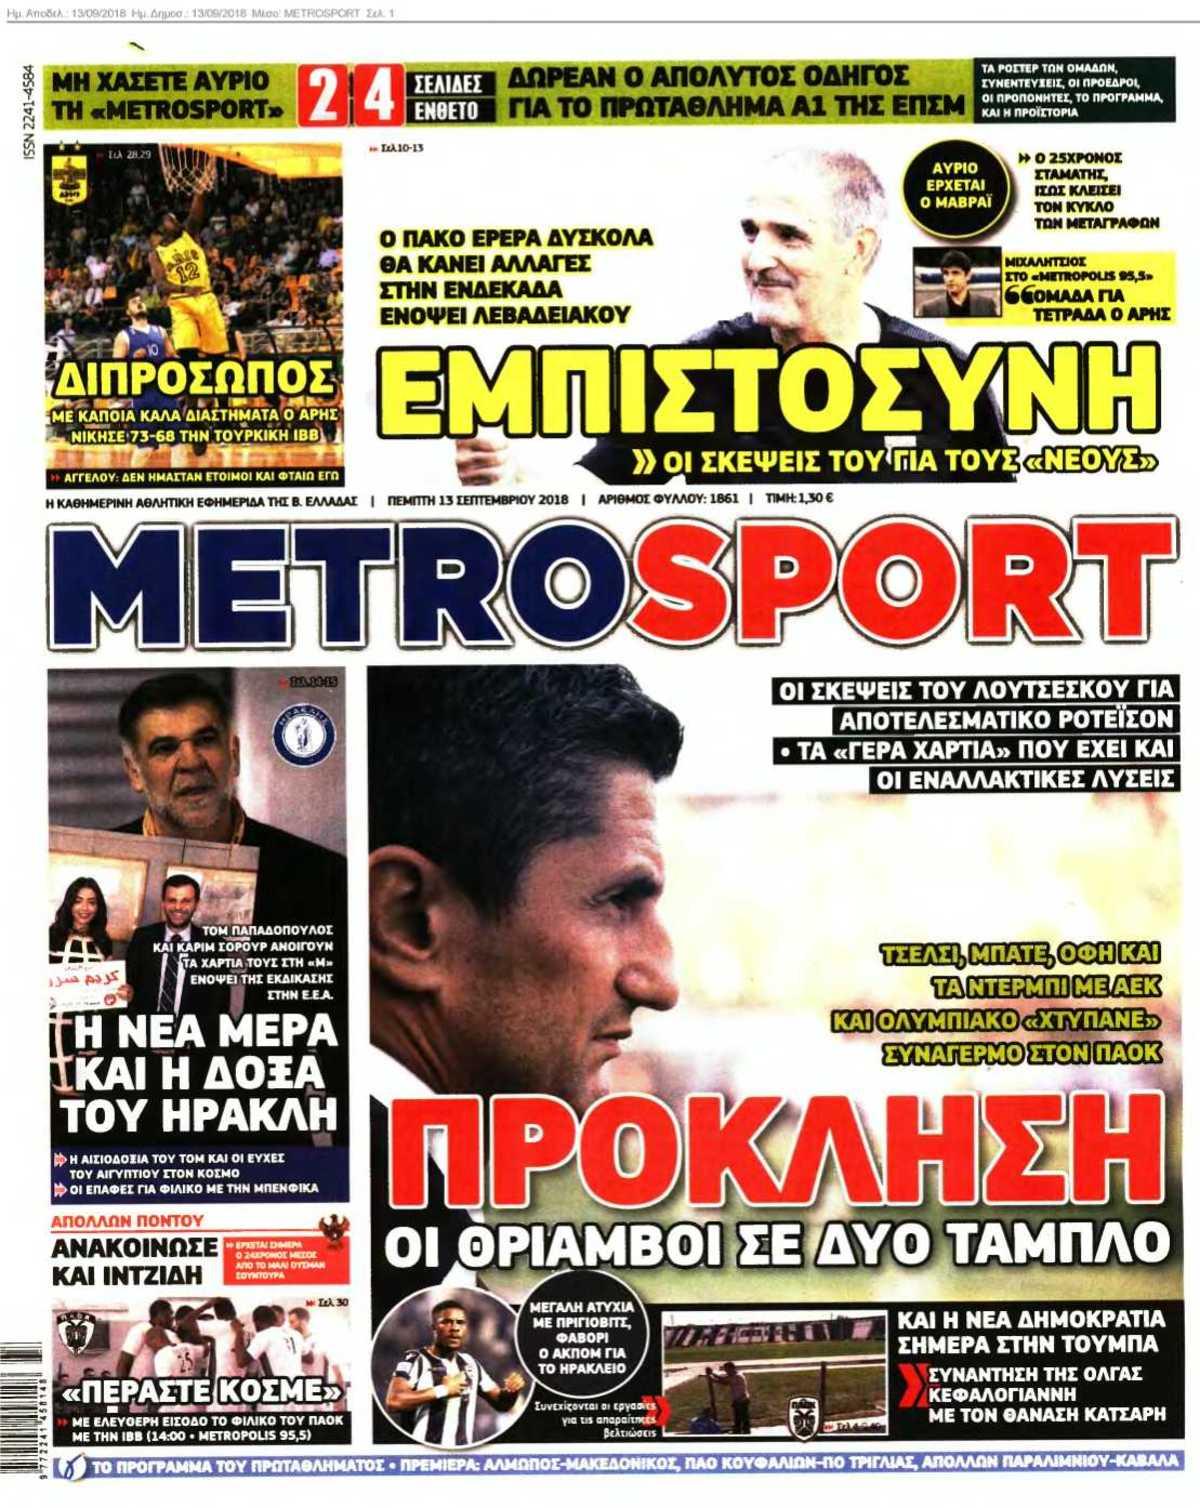 METROSPORT 13-09-2018 - Newsit.gr b618701e43b